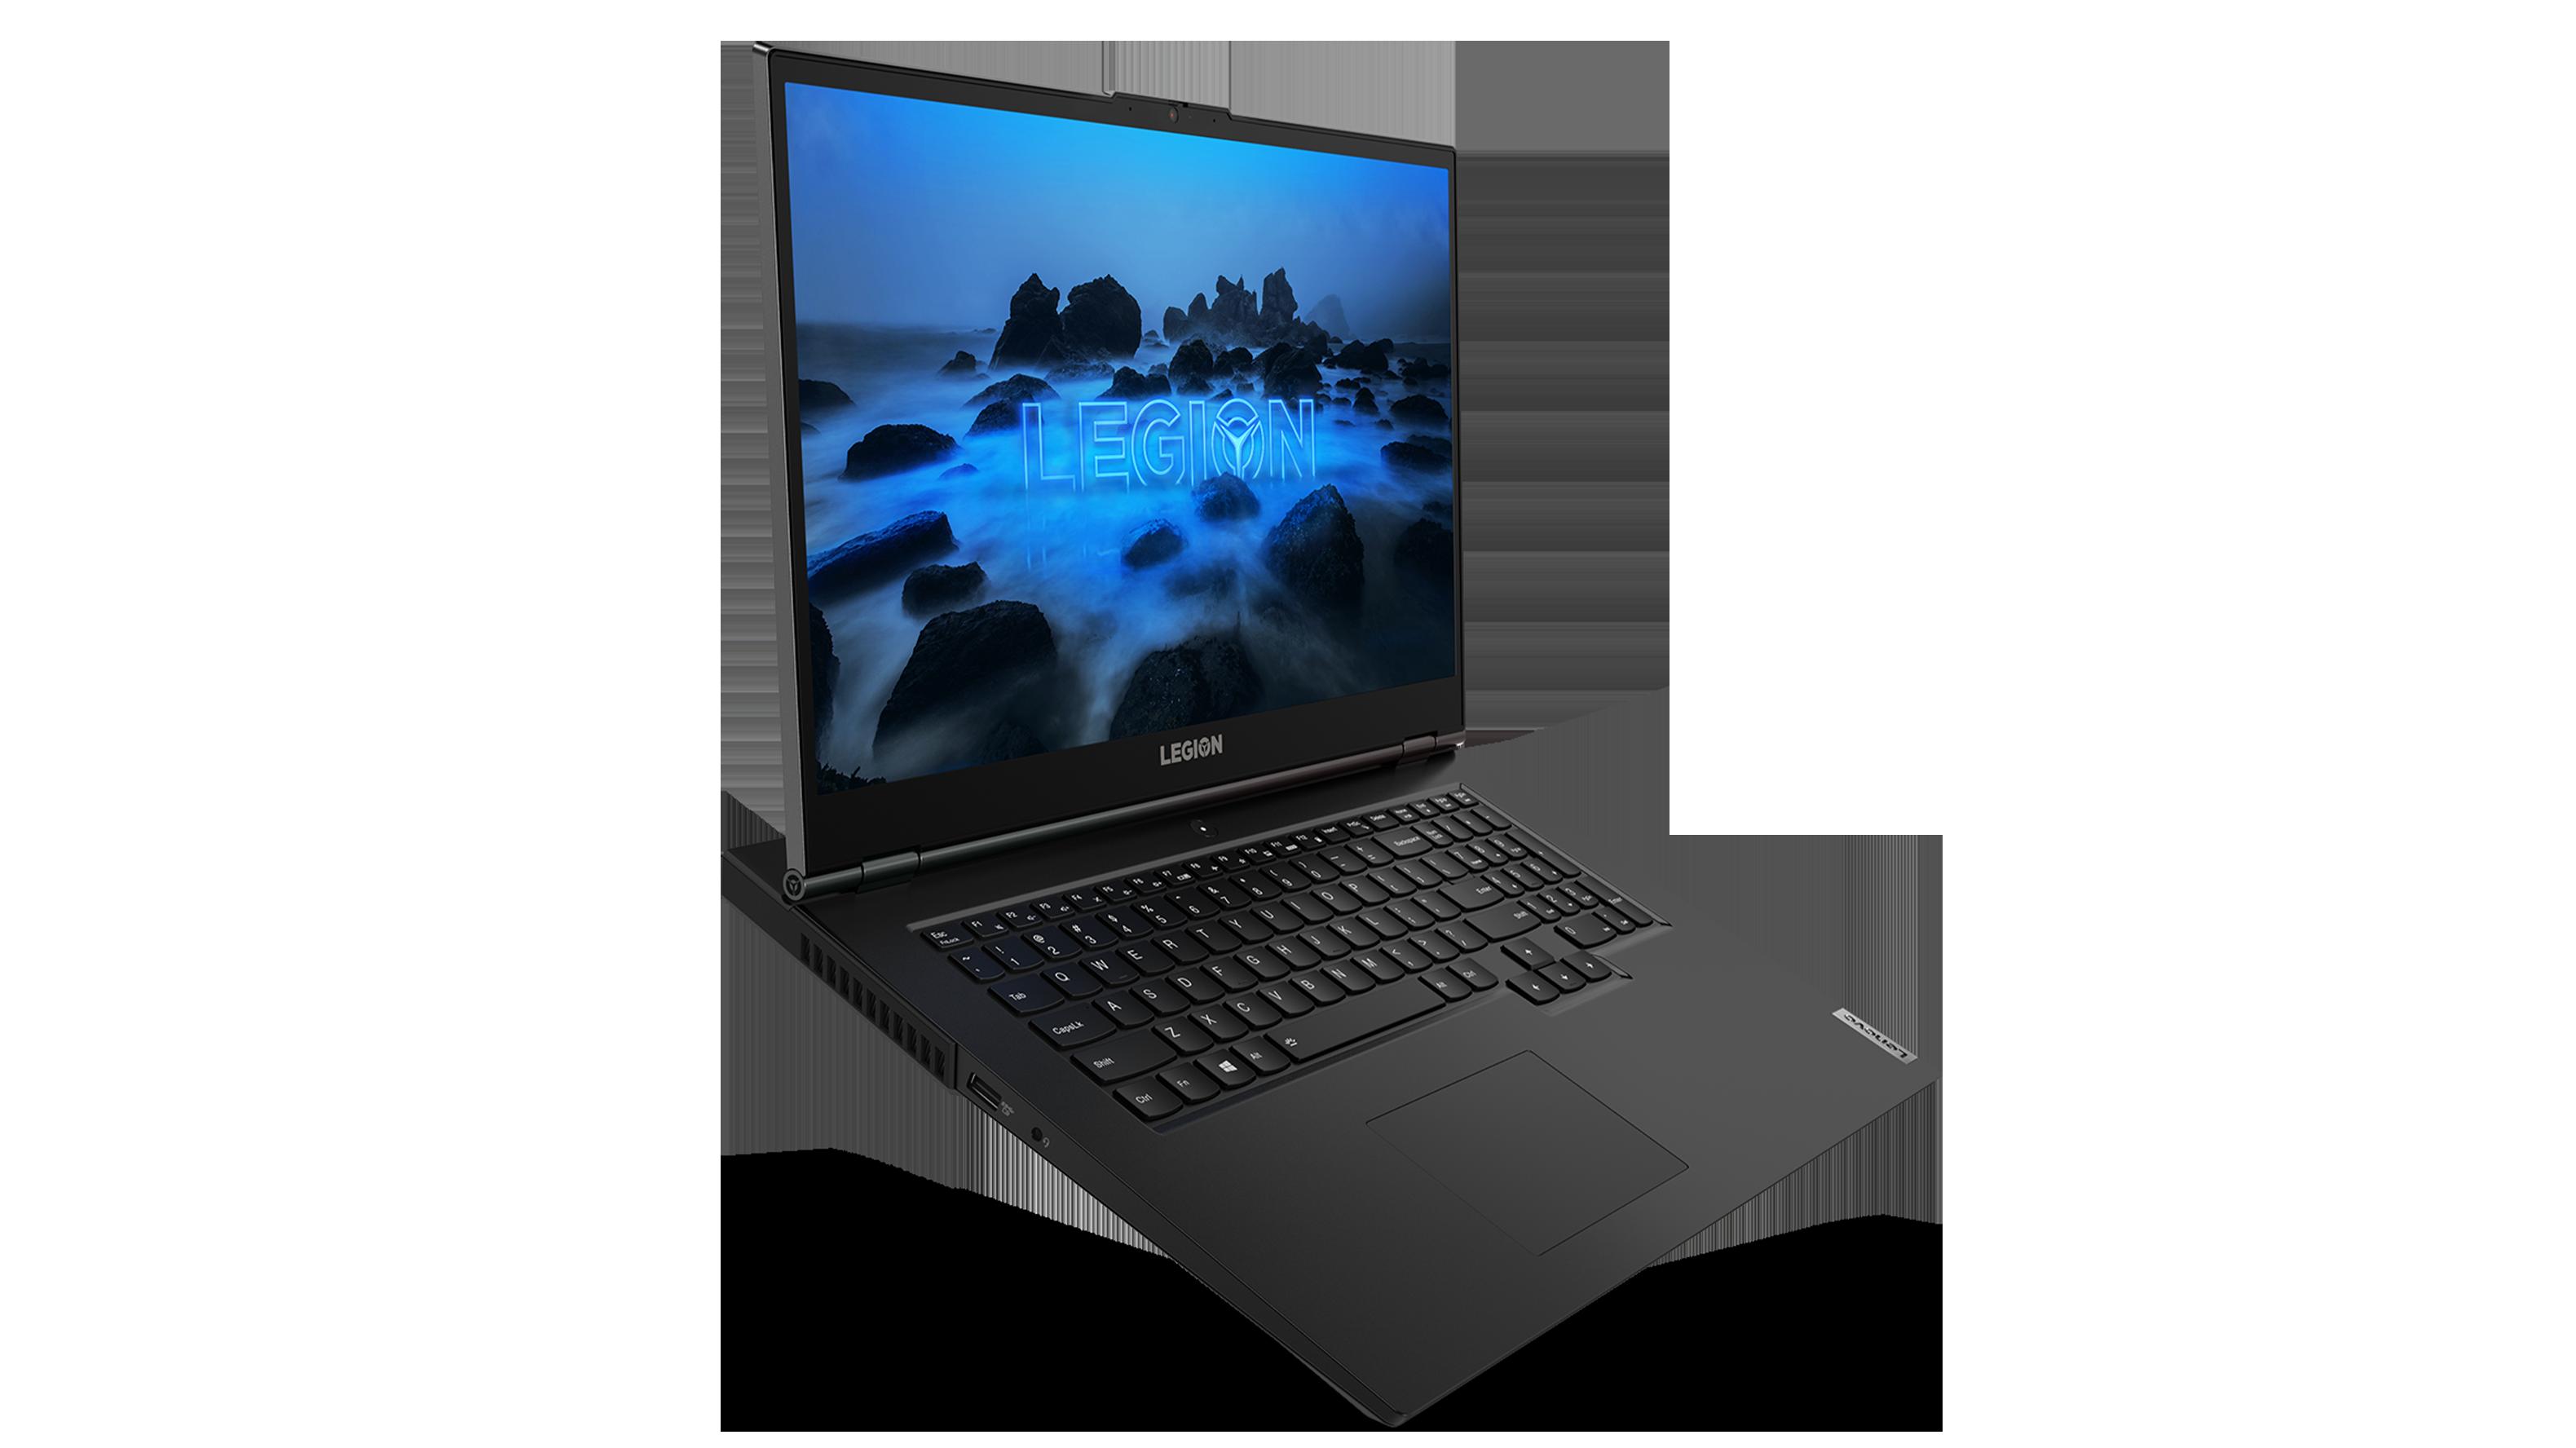 Lenovo Unveils New Legion Gaming Laptops With Amd Ryzen Cpus